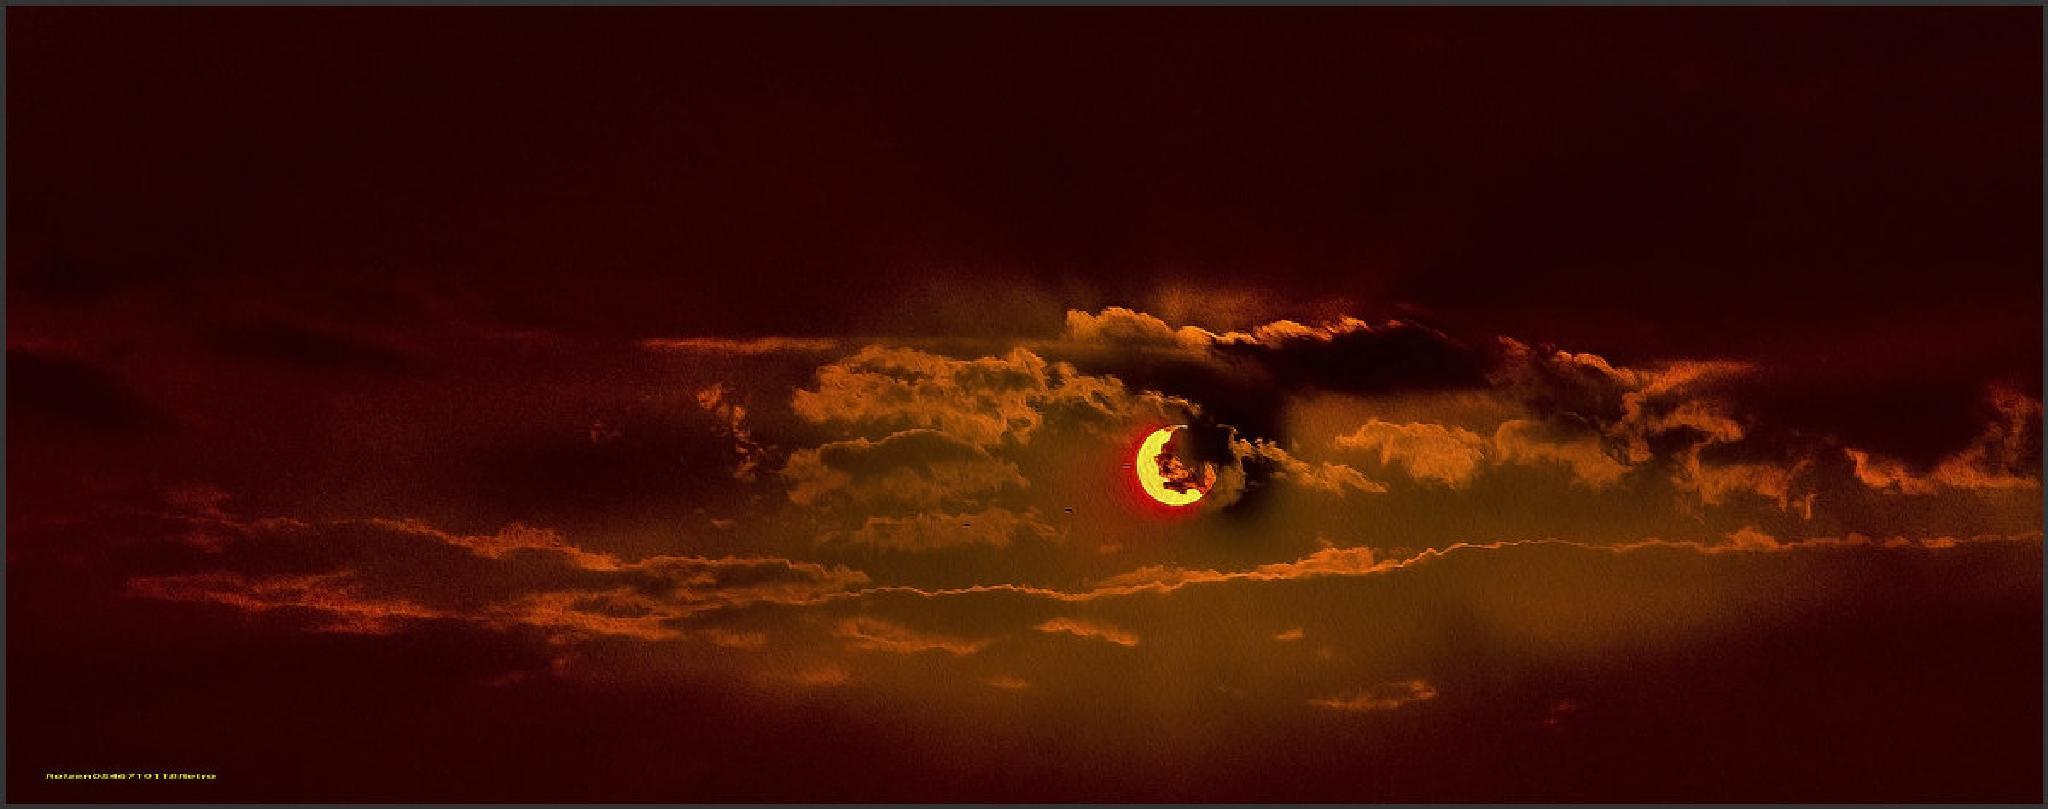 Who says the sky is blue? (2) by SHMUAL HAVA RETRO